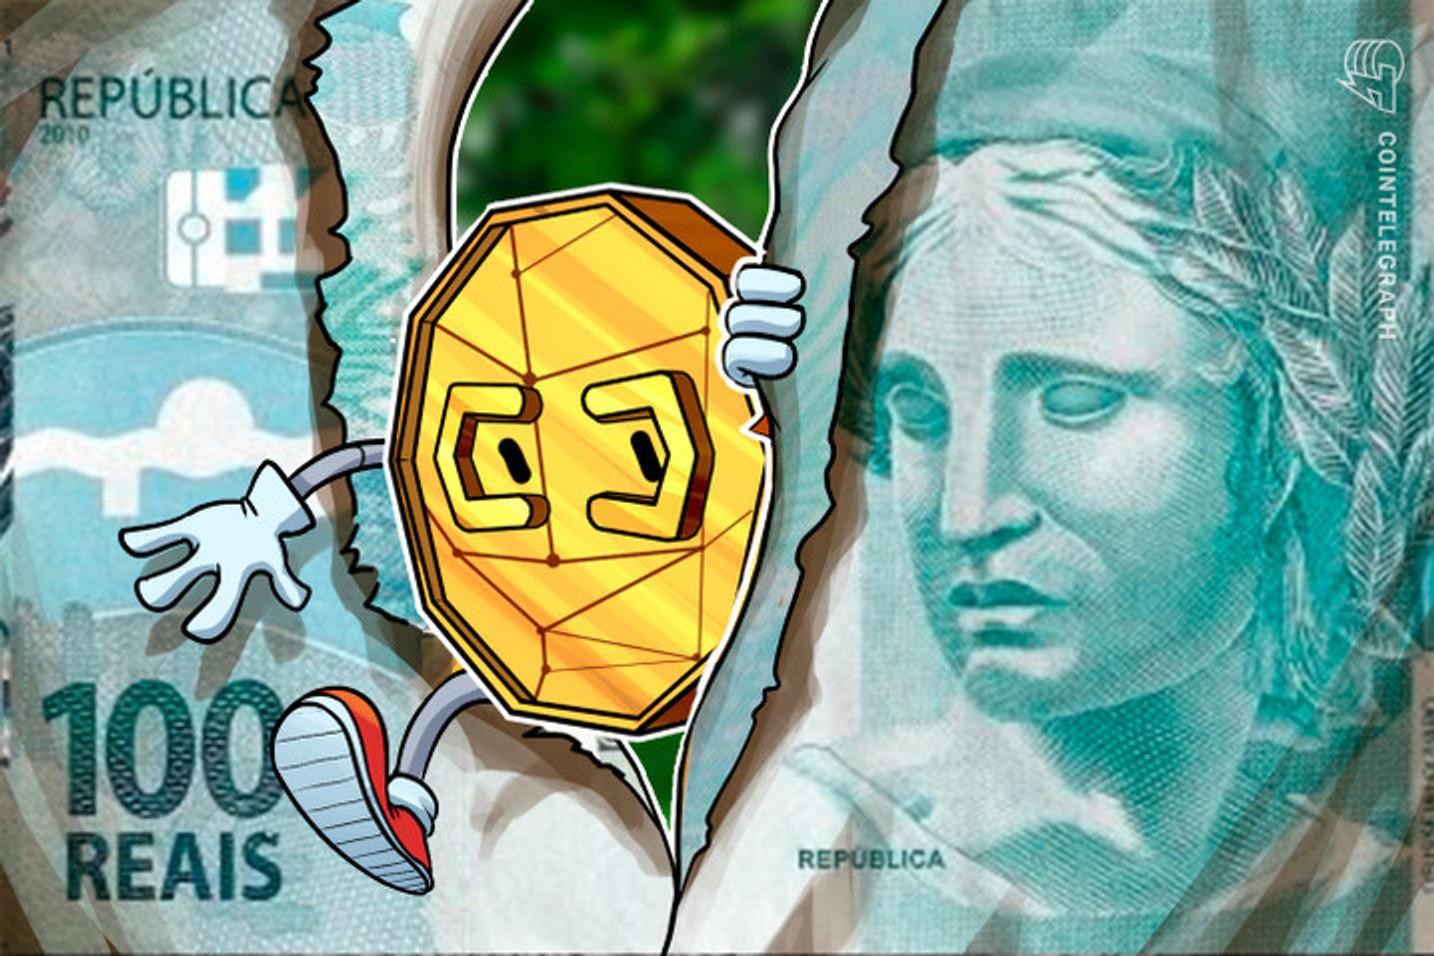 'Estamos criando hoje o Sistema Financeiro do Futuro', diz presidente do Banco Central, Roberto Campos Neto